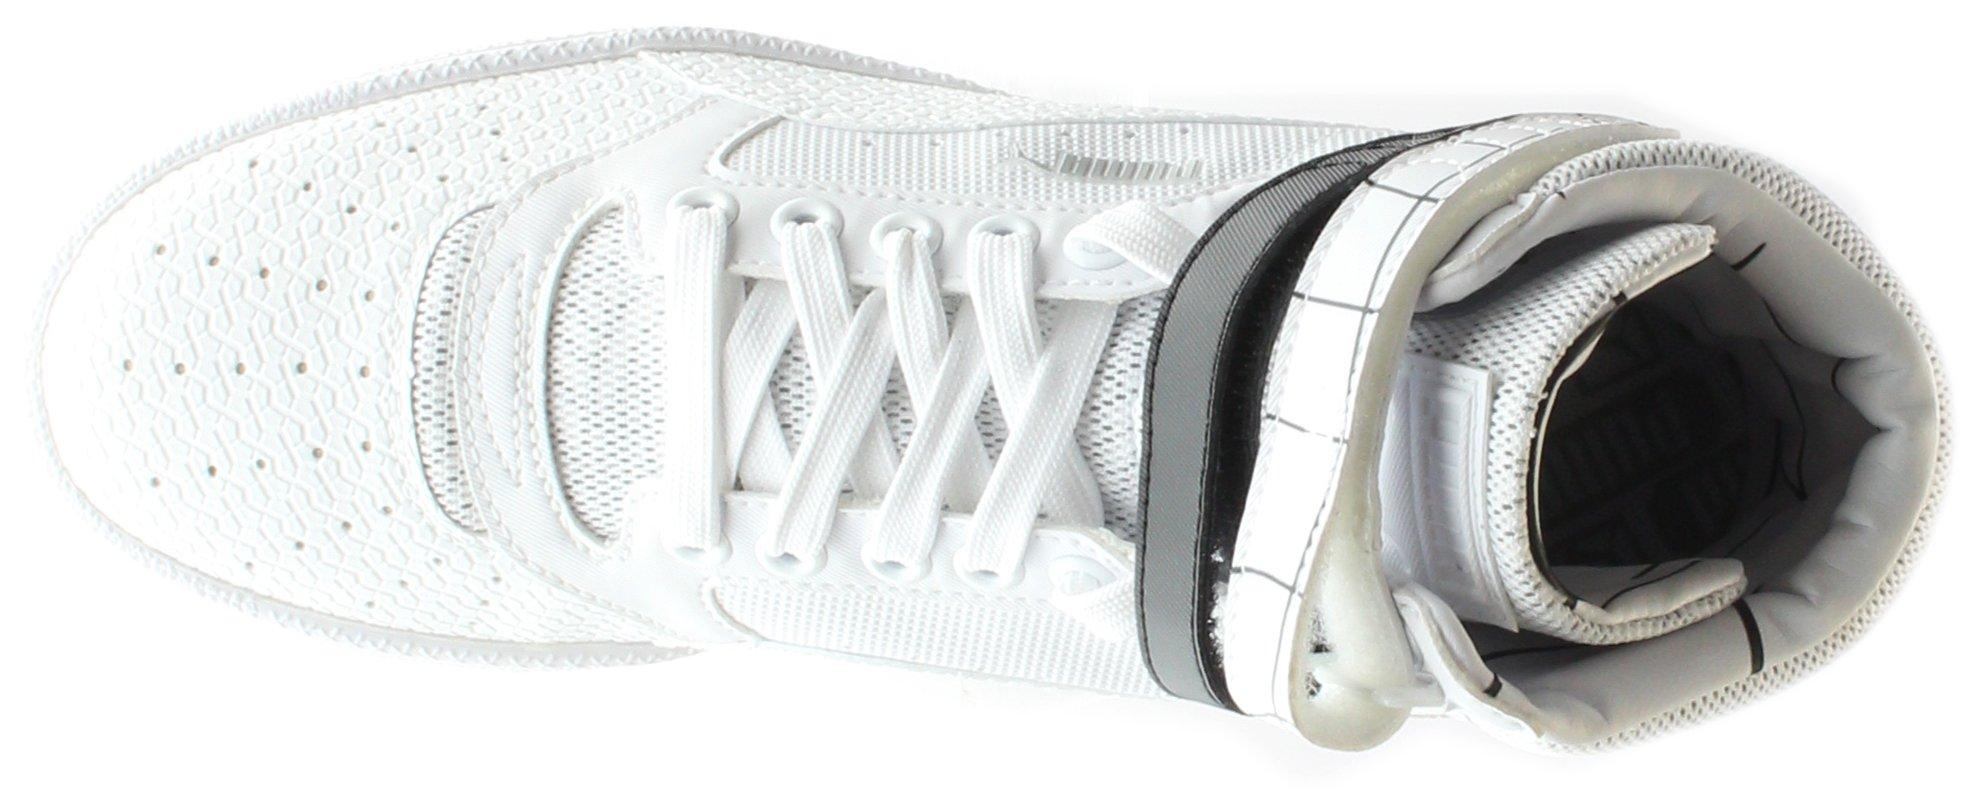 PUMA Women's Sky Ii Hi Sf Texture WN's Basketball Shoe, White Black, 8.5 M US by PUMA (Image #6)